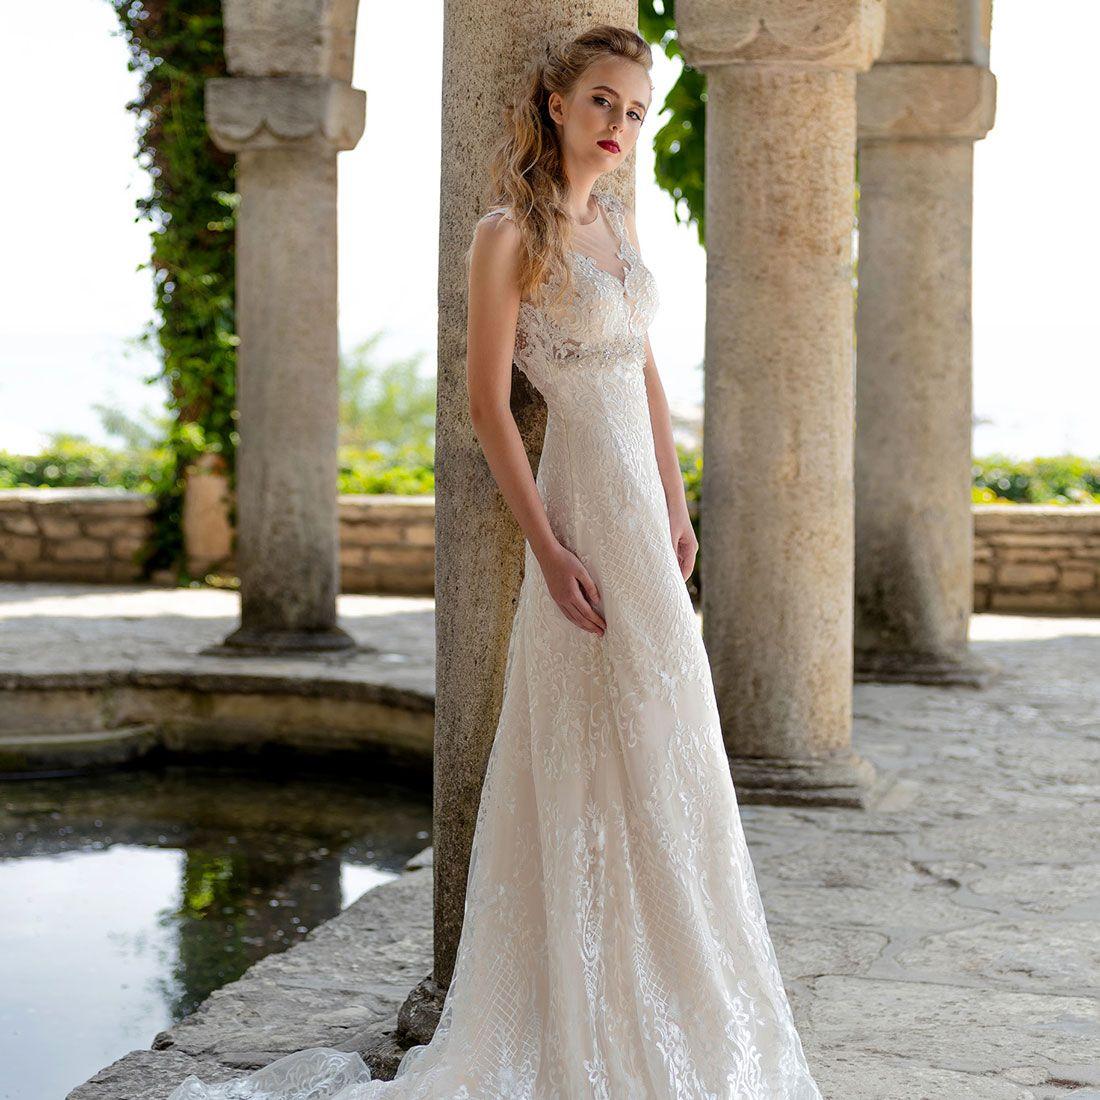 Wedding Dress Designers: Designer Wedding Dresses